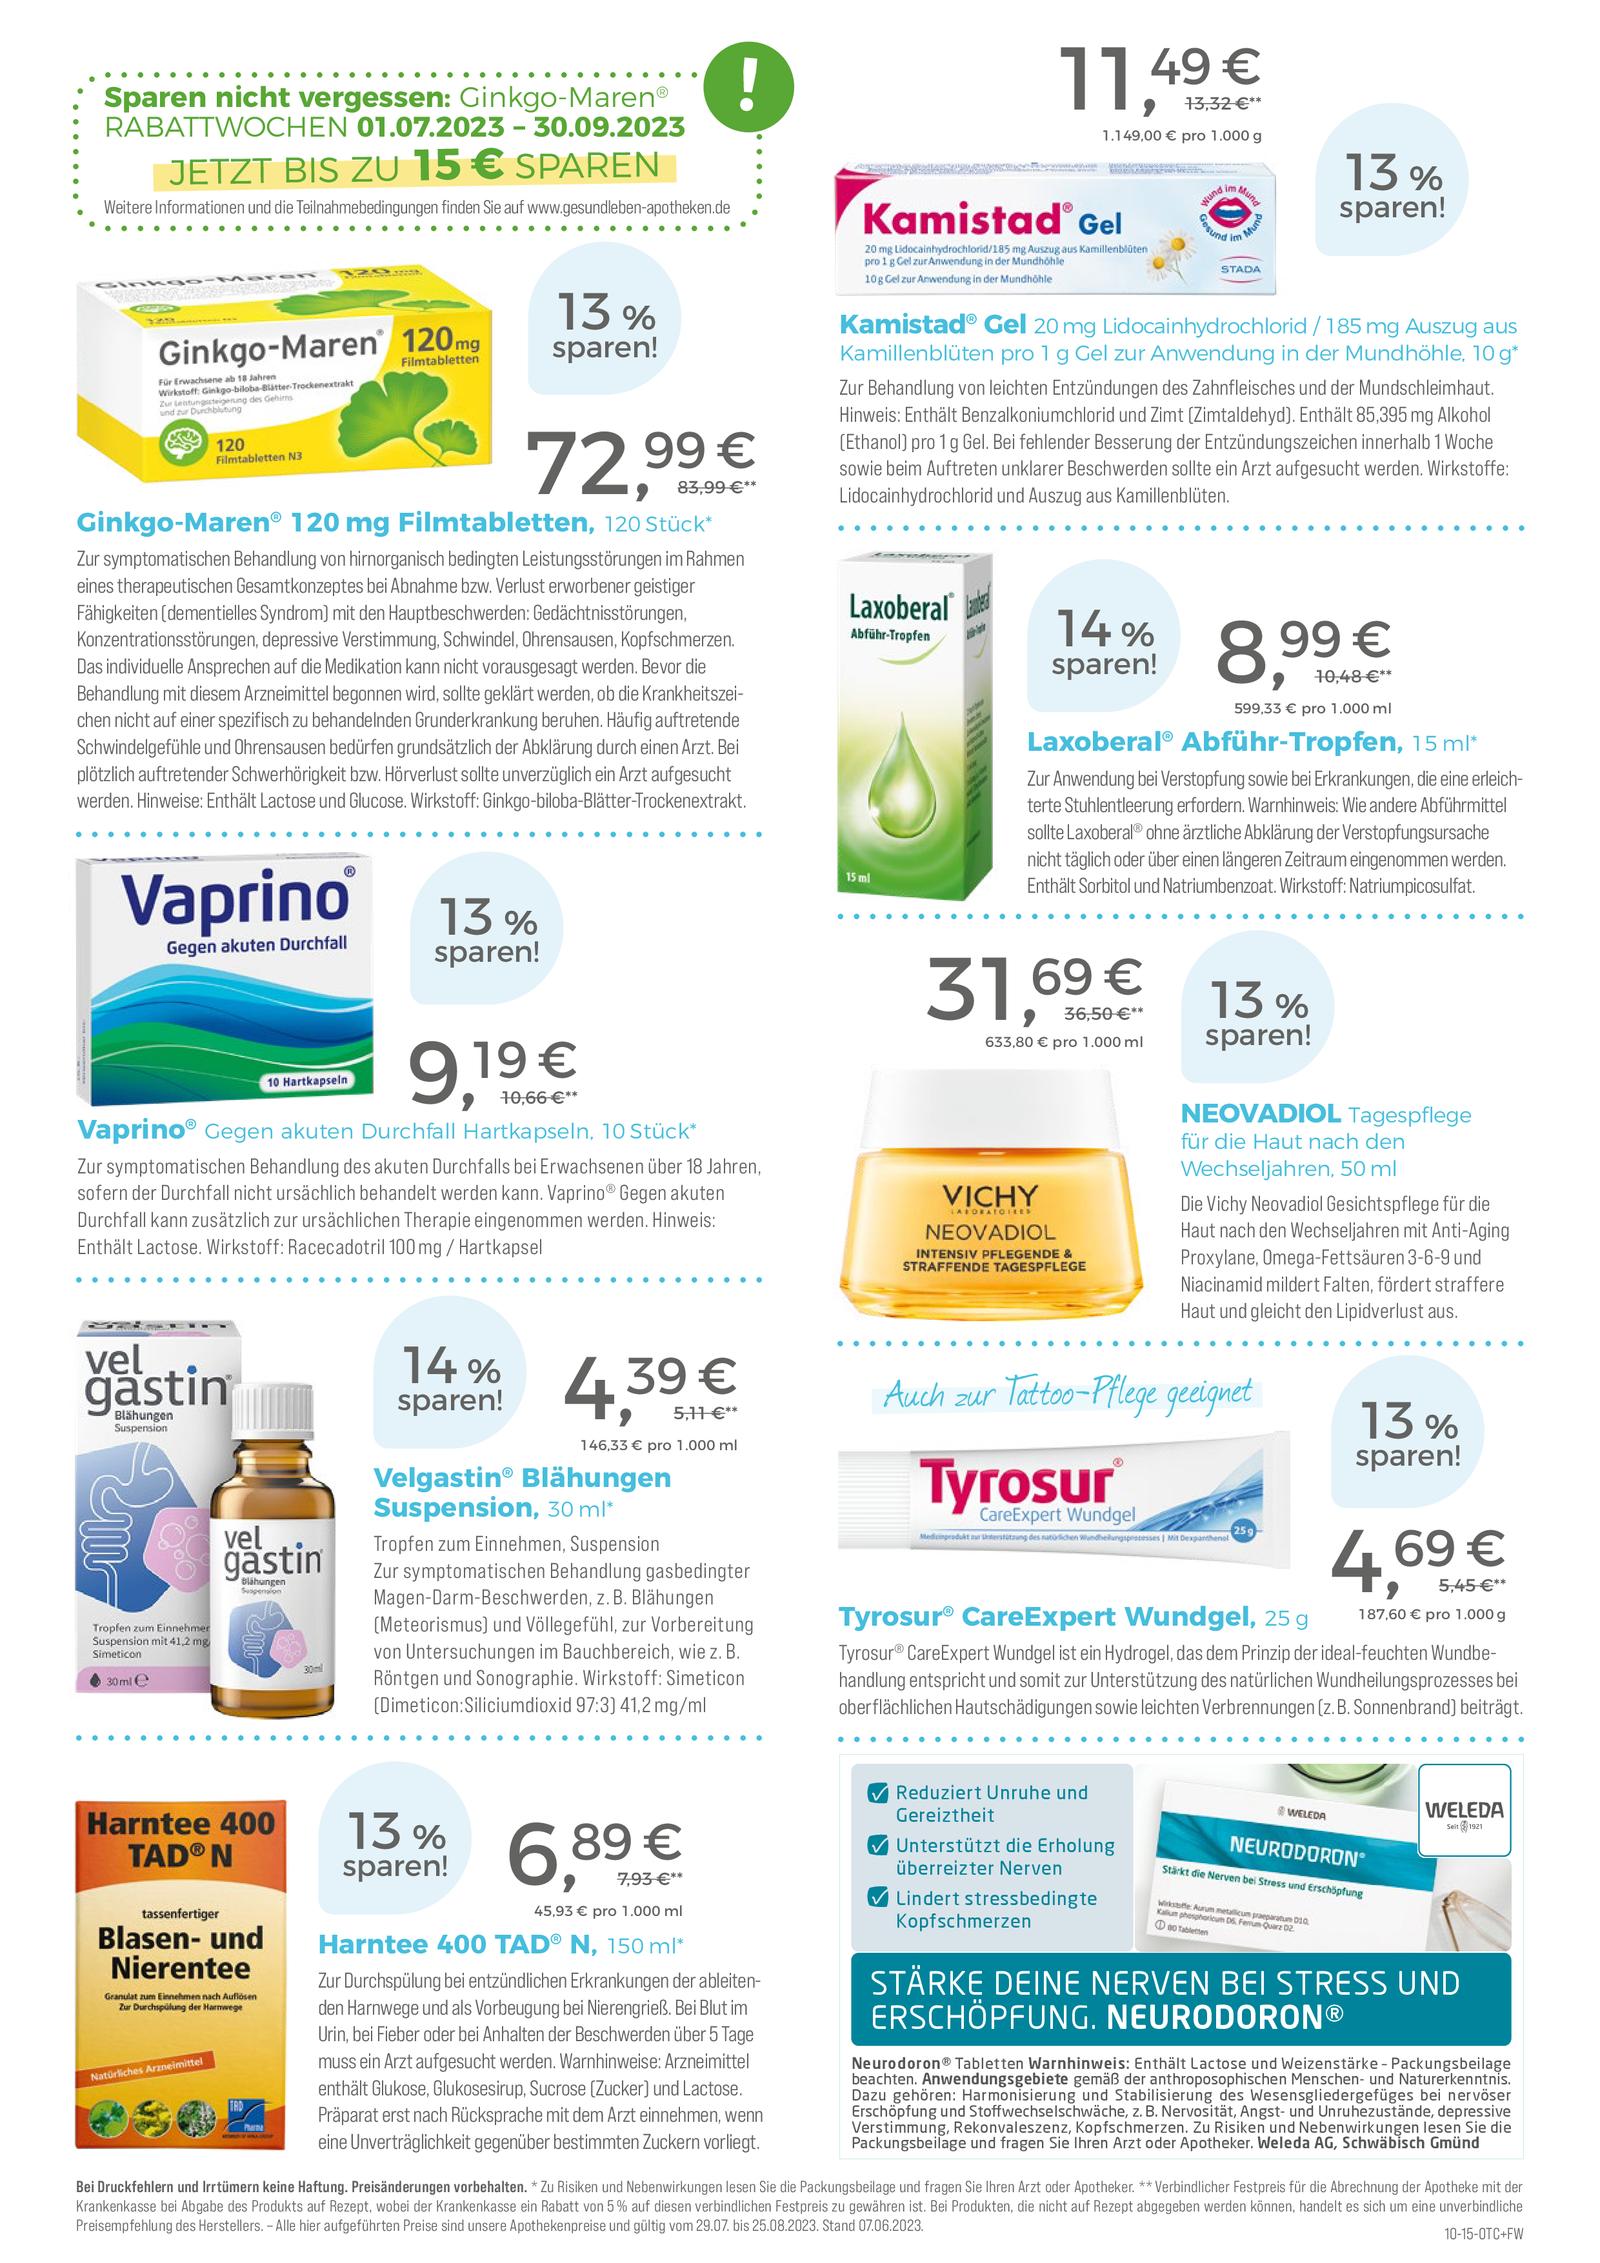 https://mein-uploads.apocdn.net/28462/leaflets/gesundleben_niedrig-Seite3.png